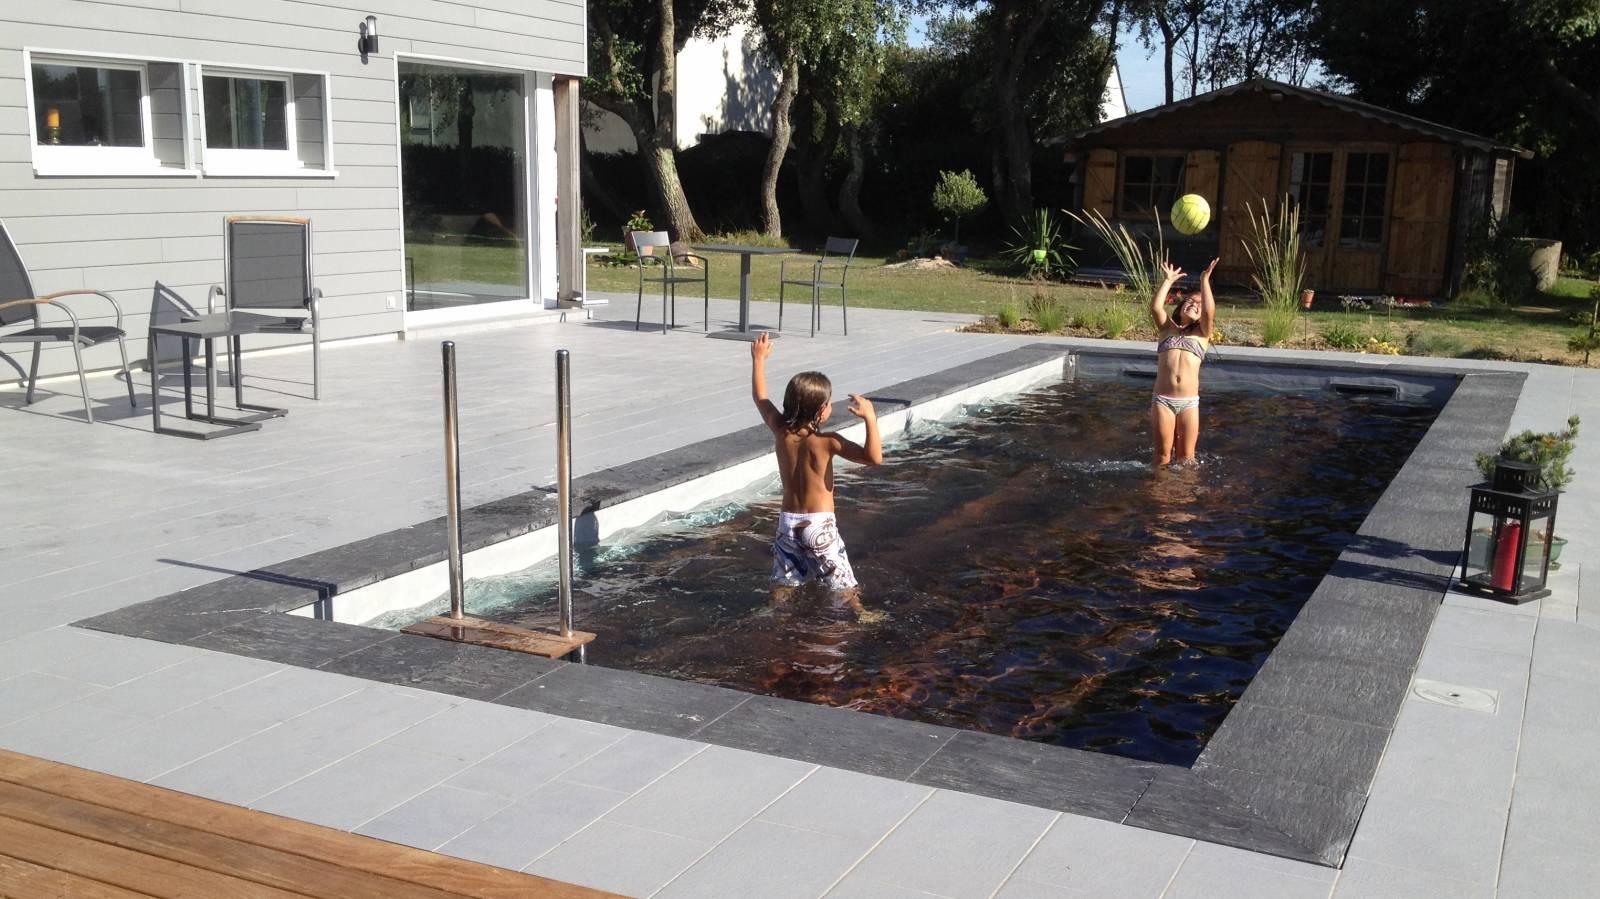 Fabricant de piscine fond mobile amphibia for Fabricant de piscine